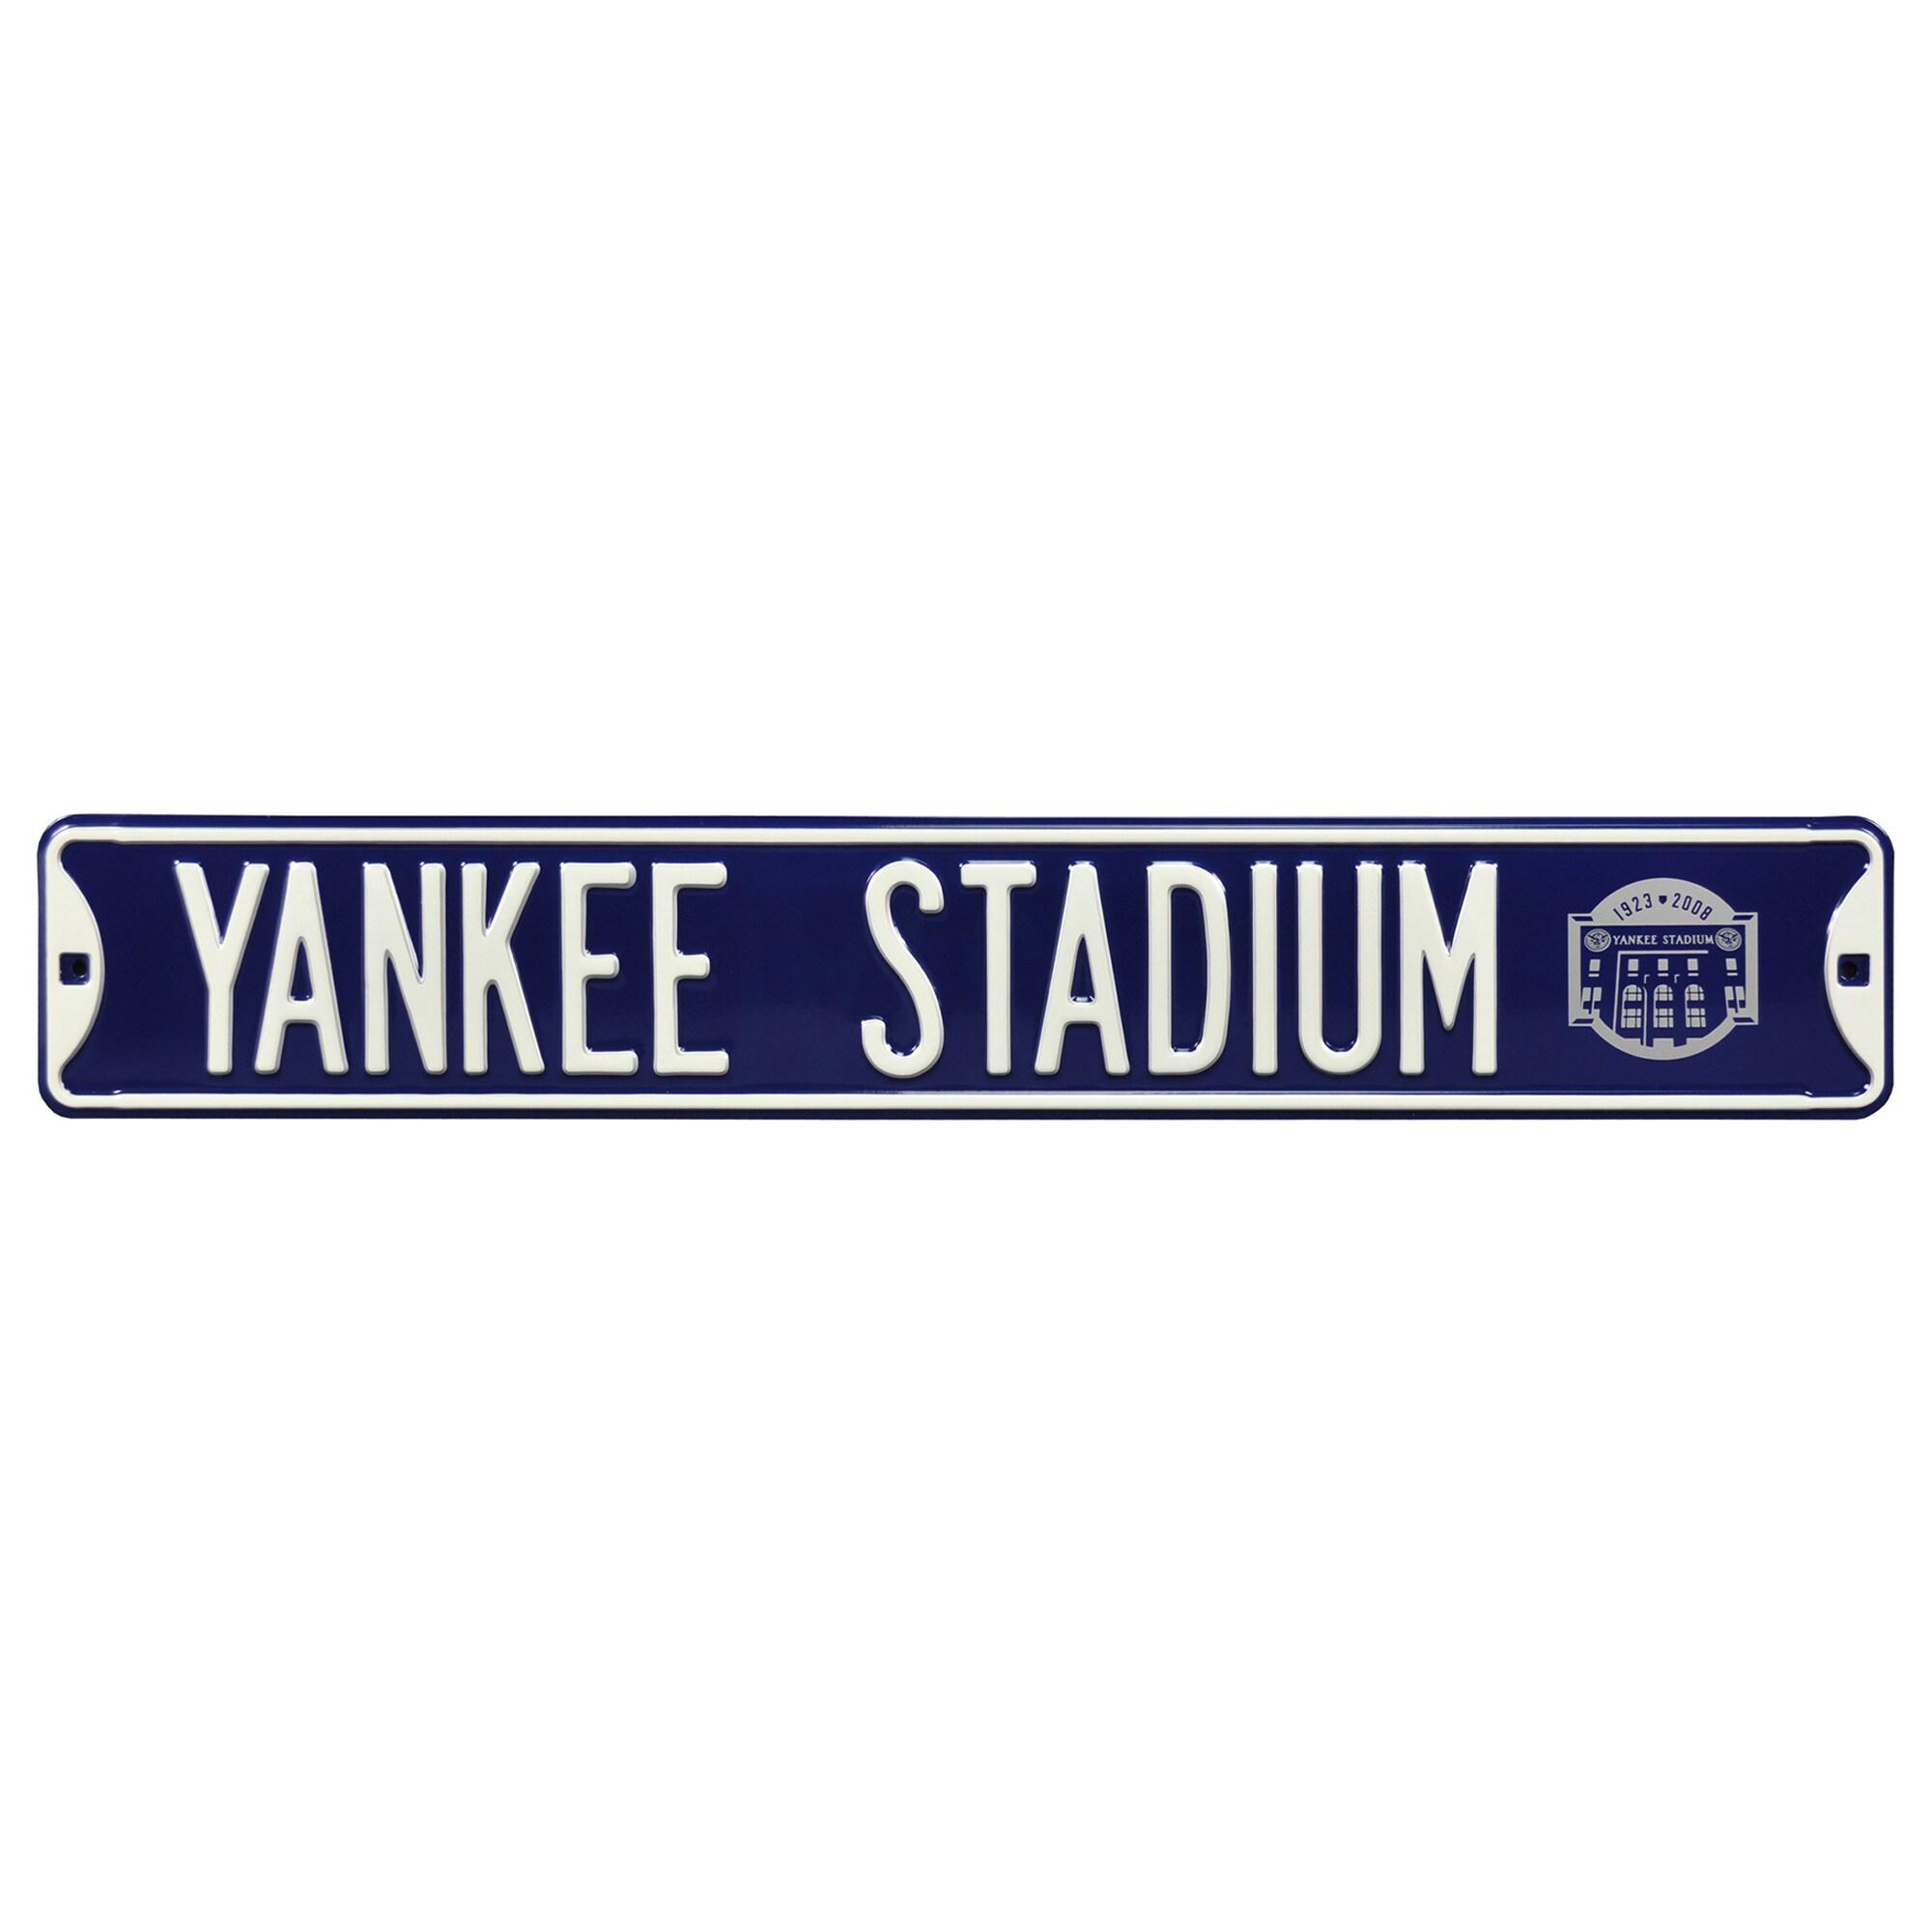 New York Yankees Yankee Stadium Steel Street Sign